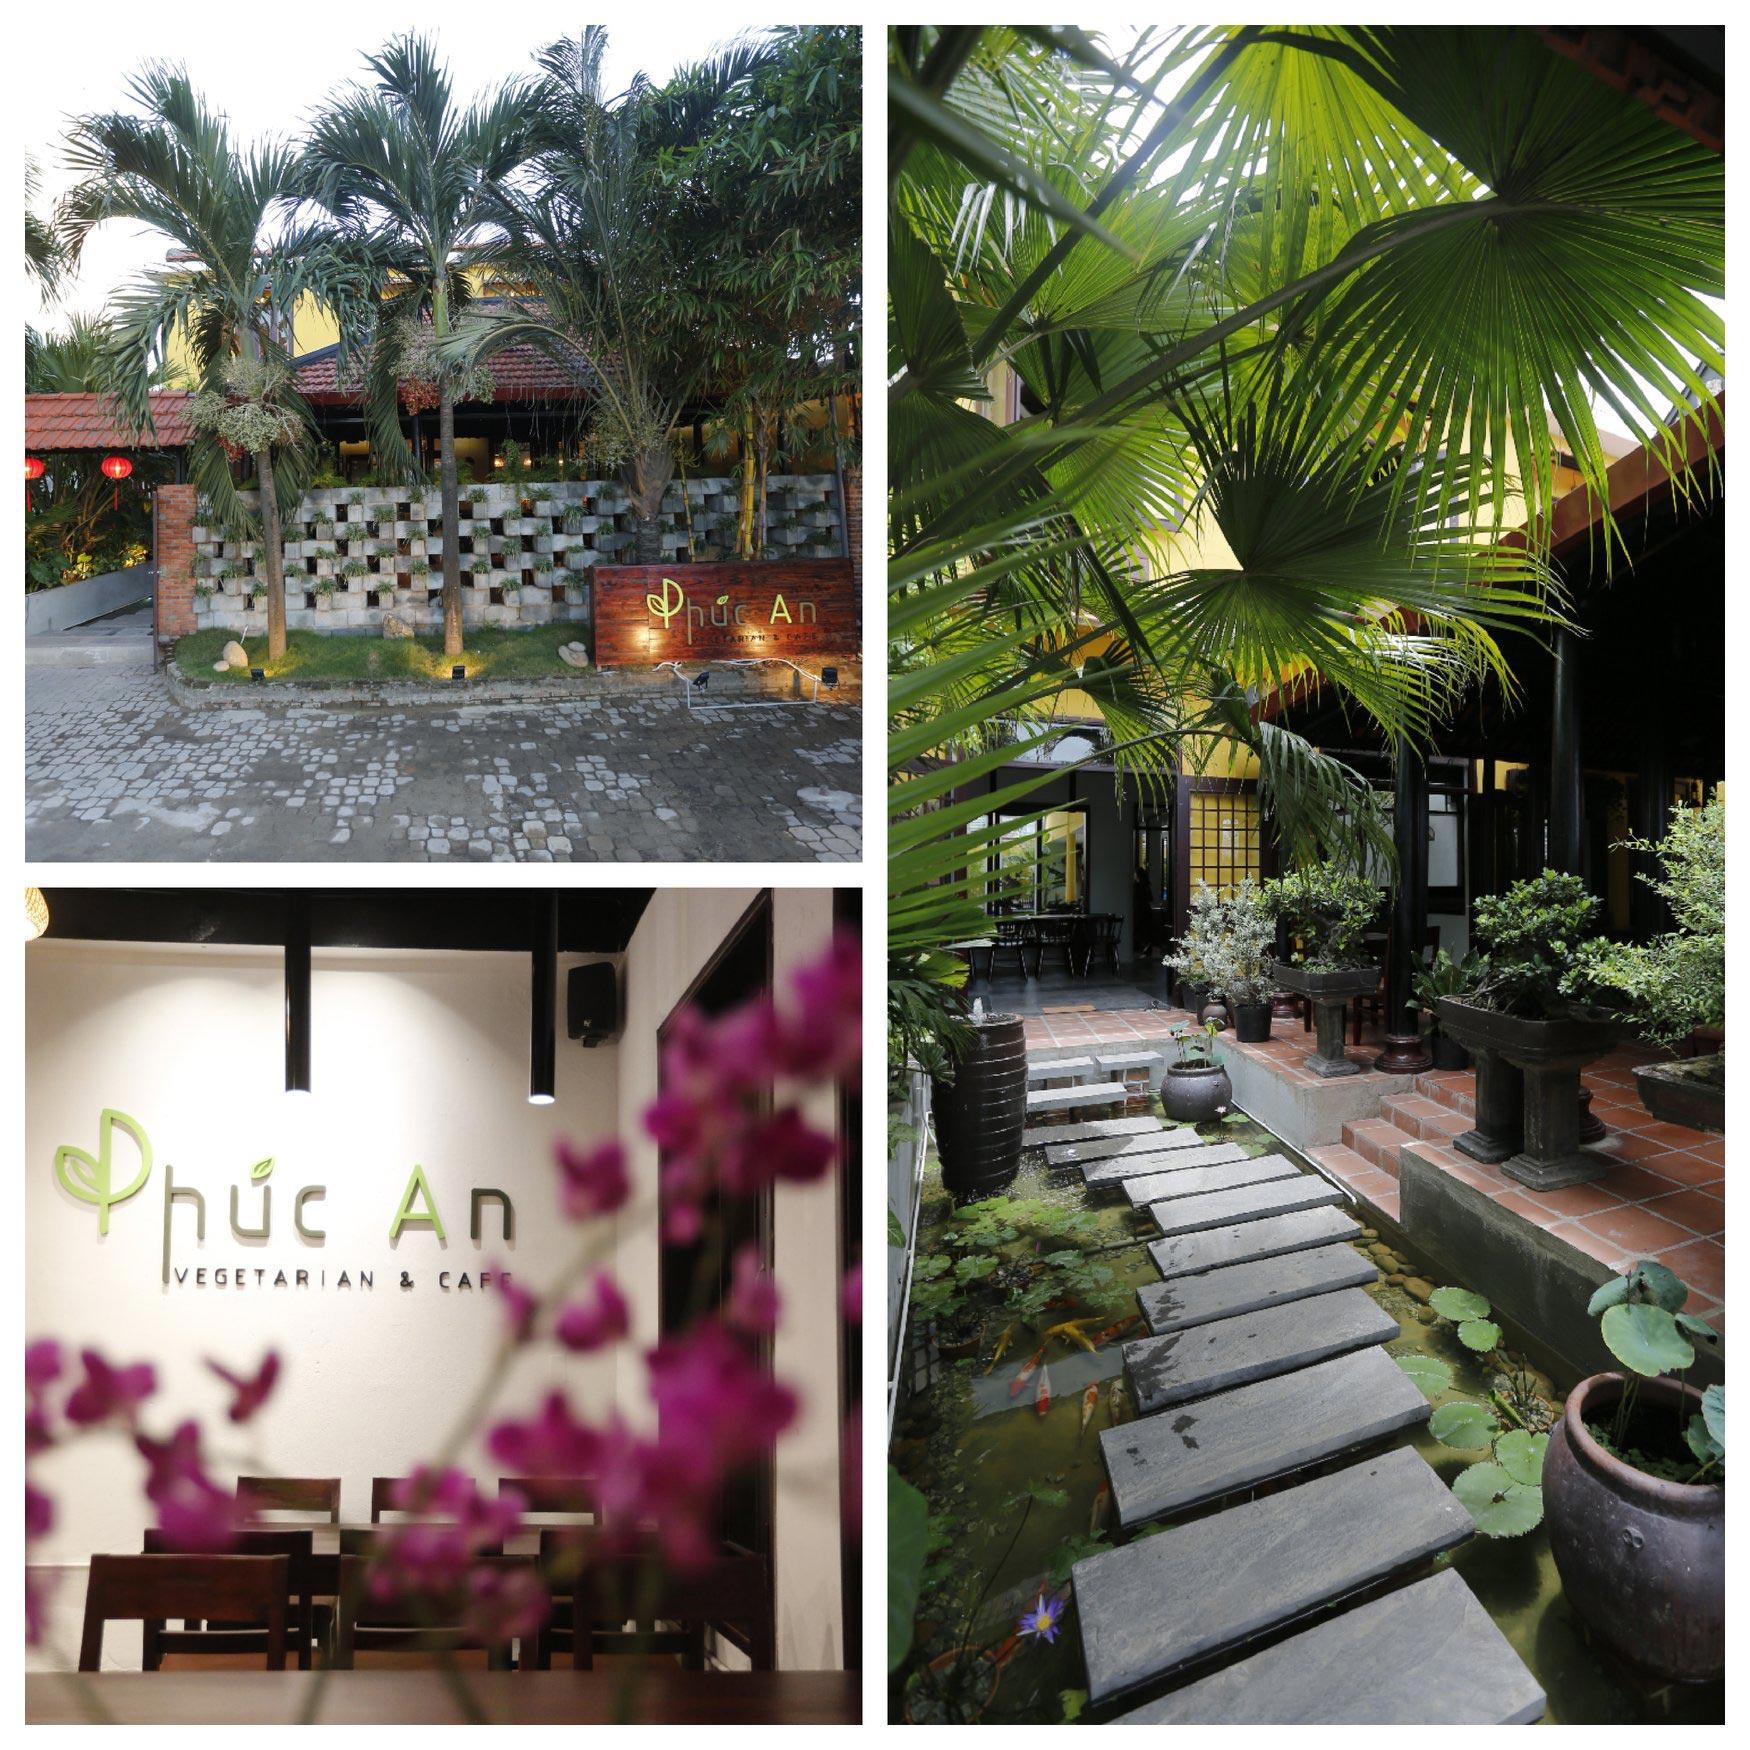 Phuc An Vegetarian & Café